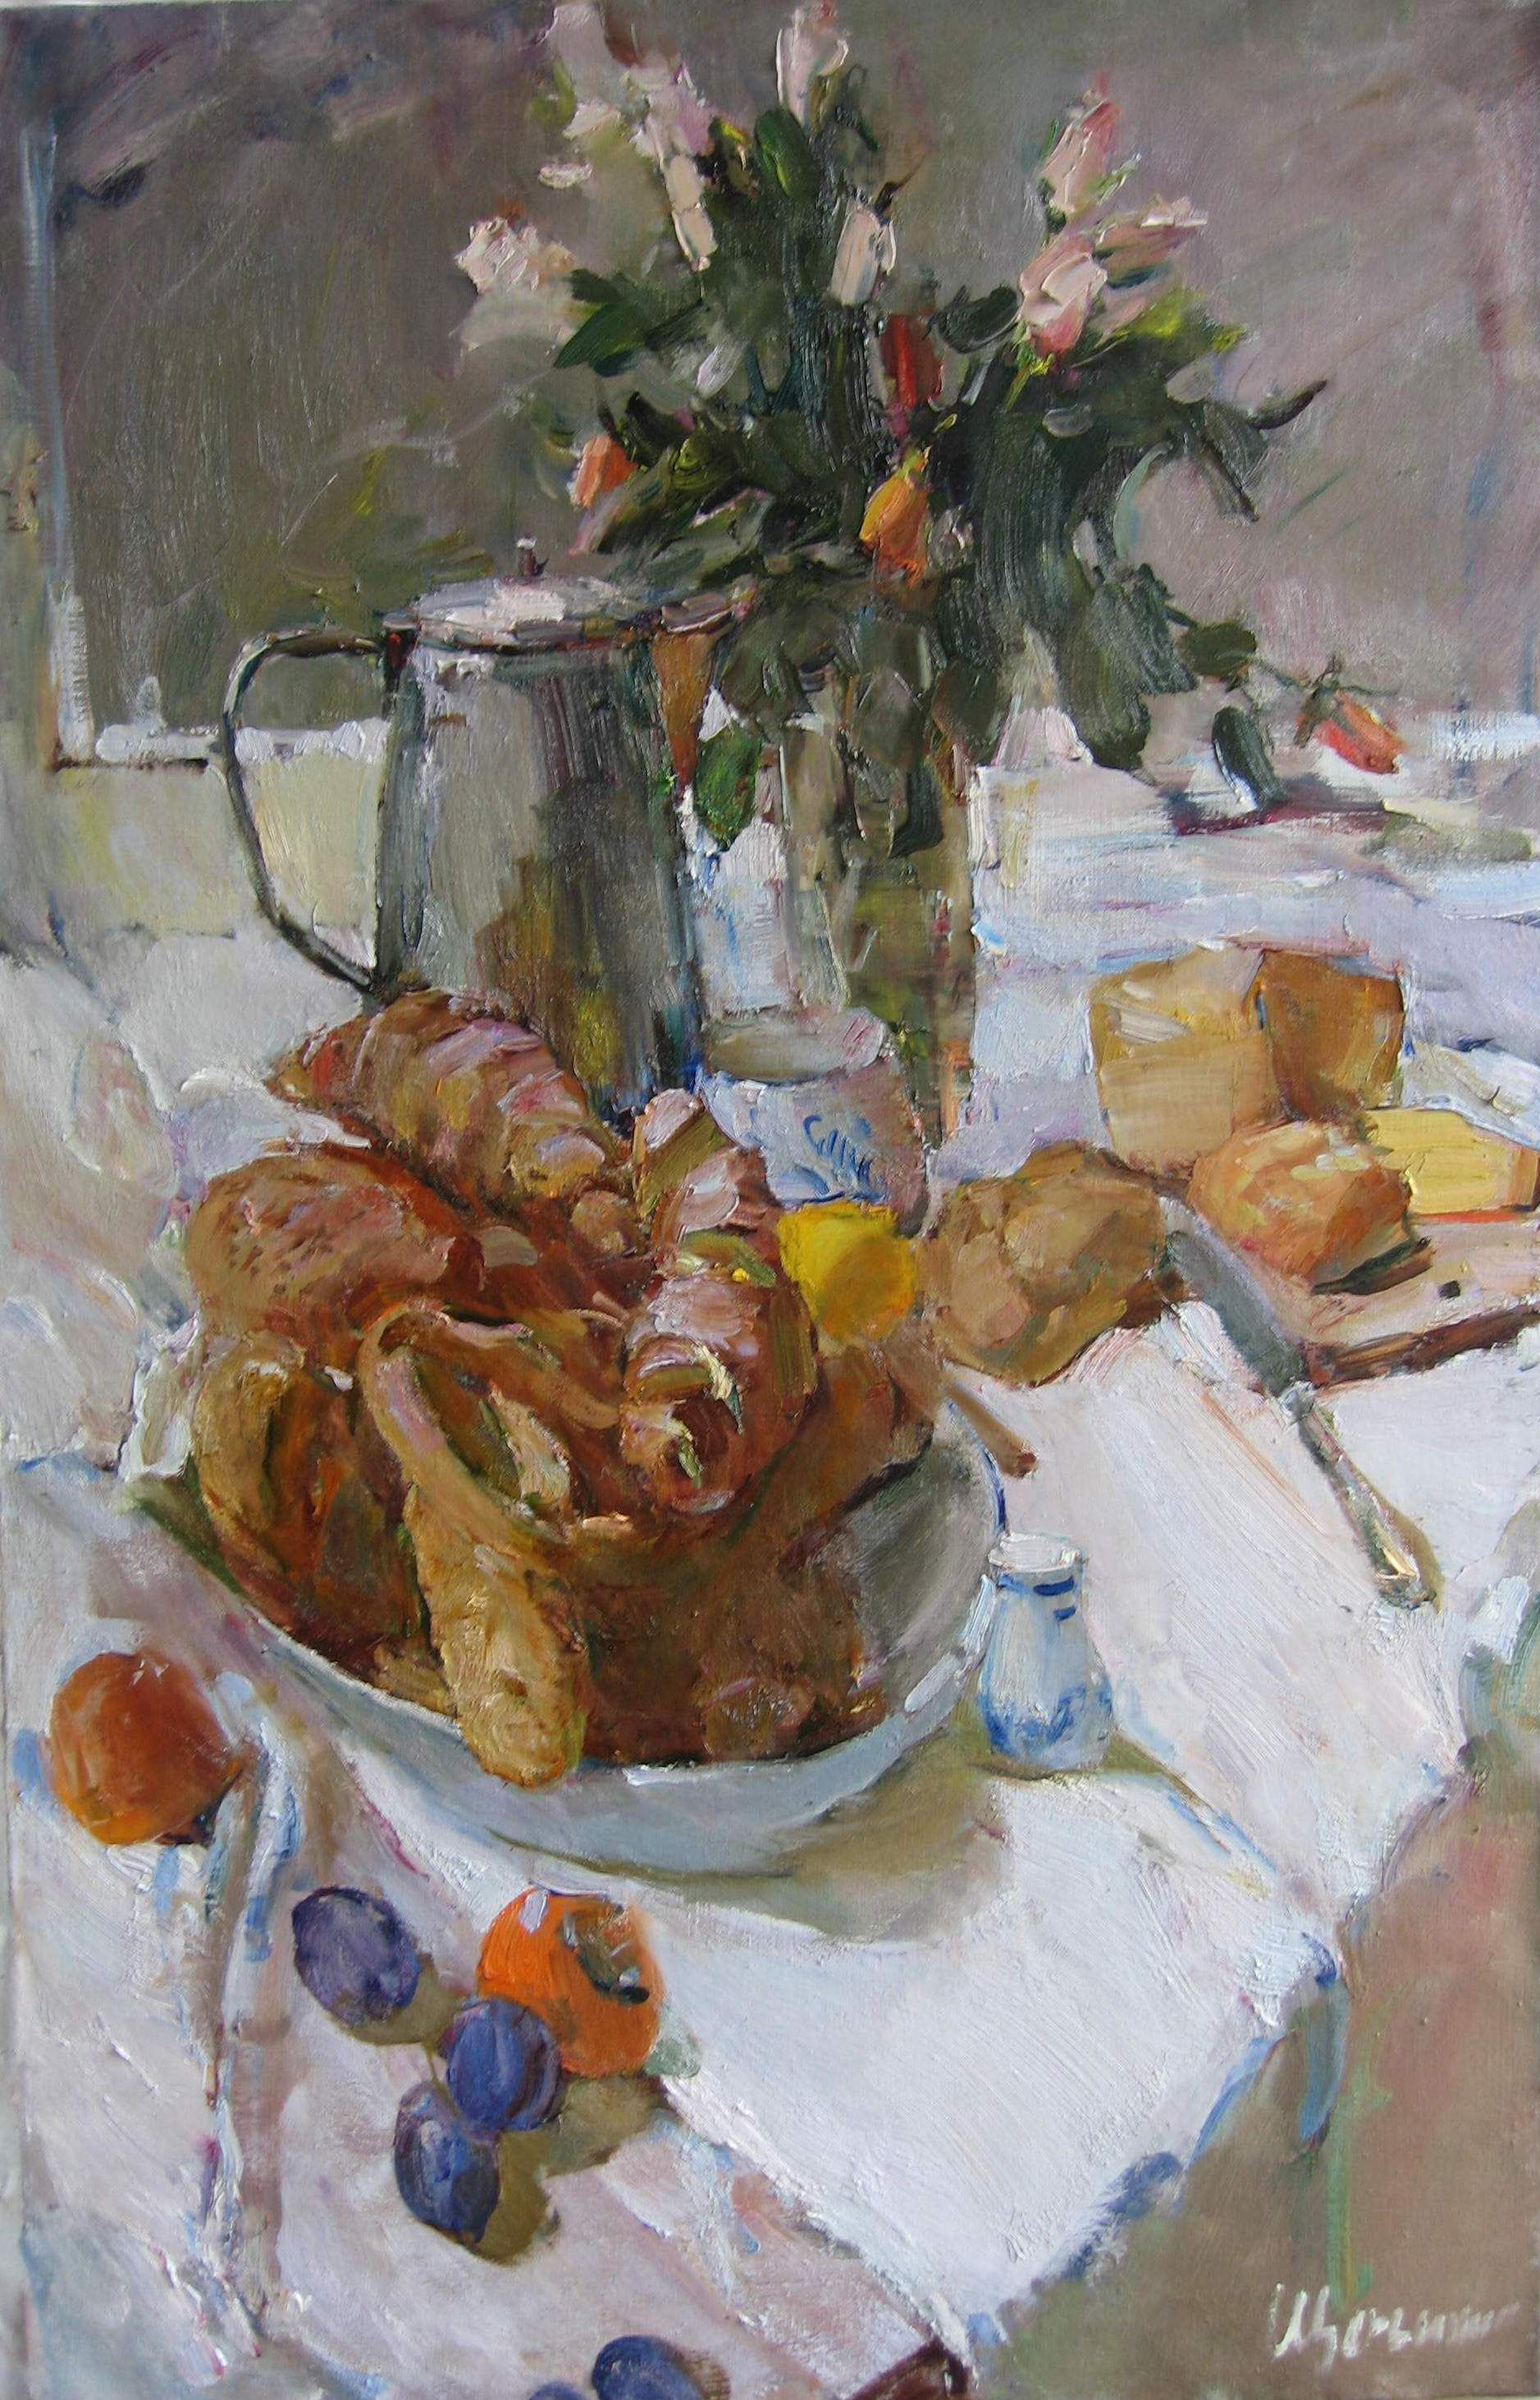 Lydmila Sherbinina . Still life with the bread. 39x27in. oil on canvas.JPG